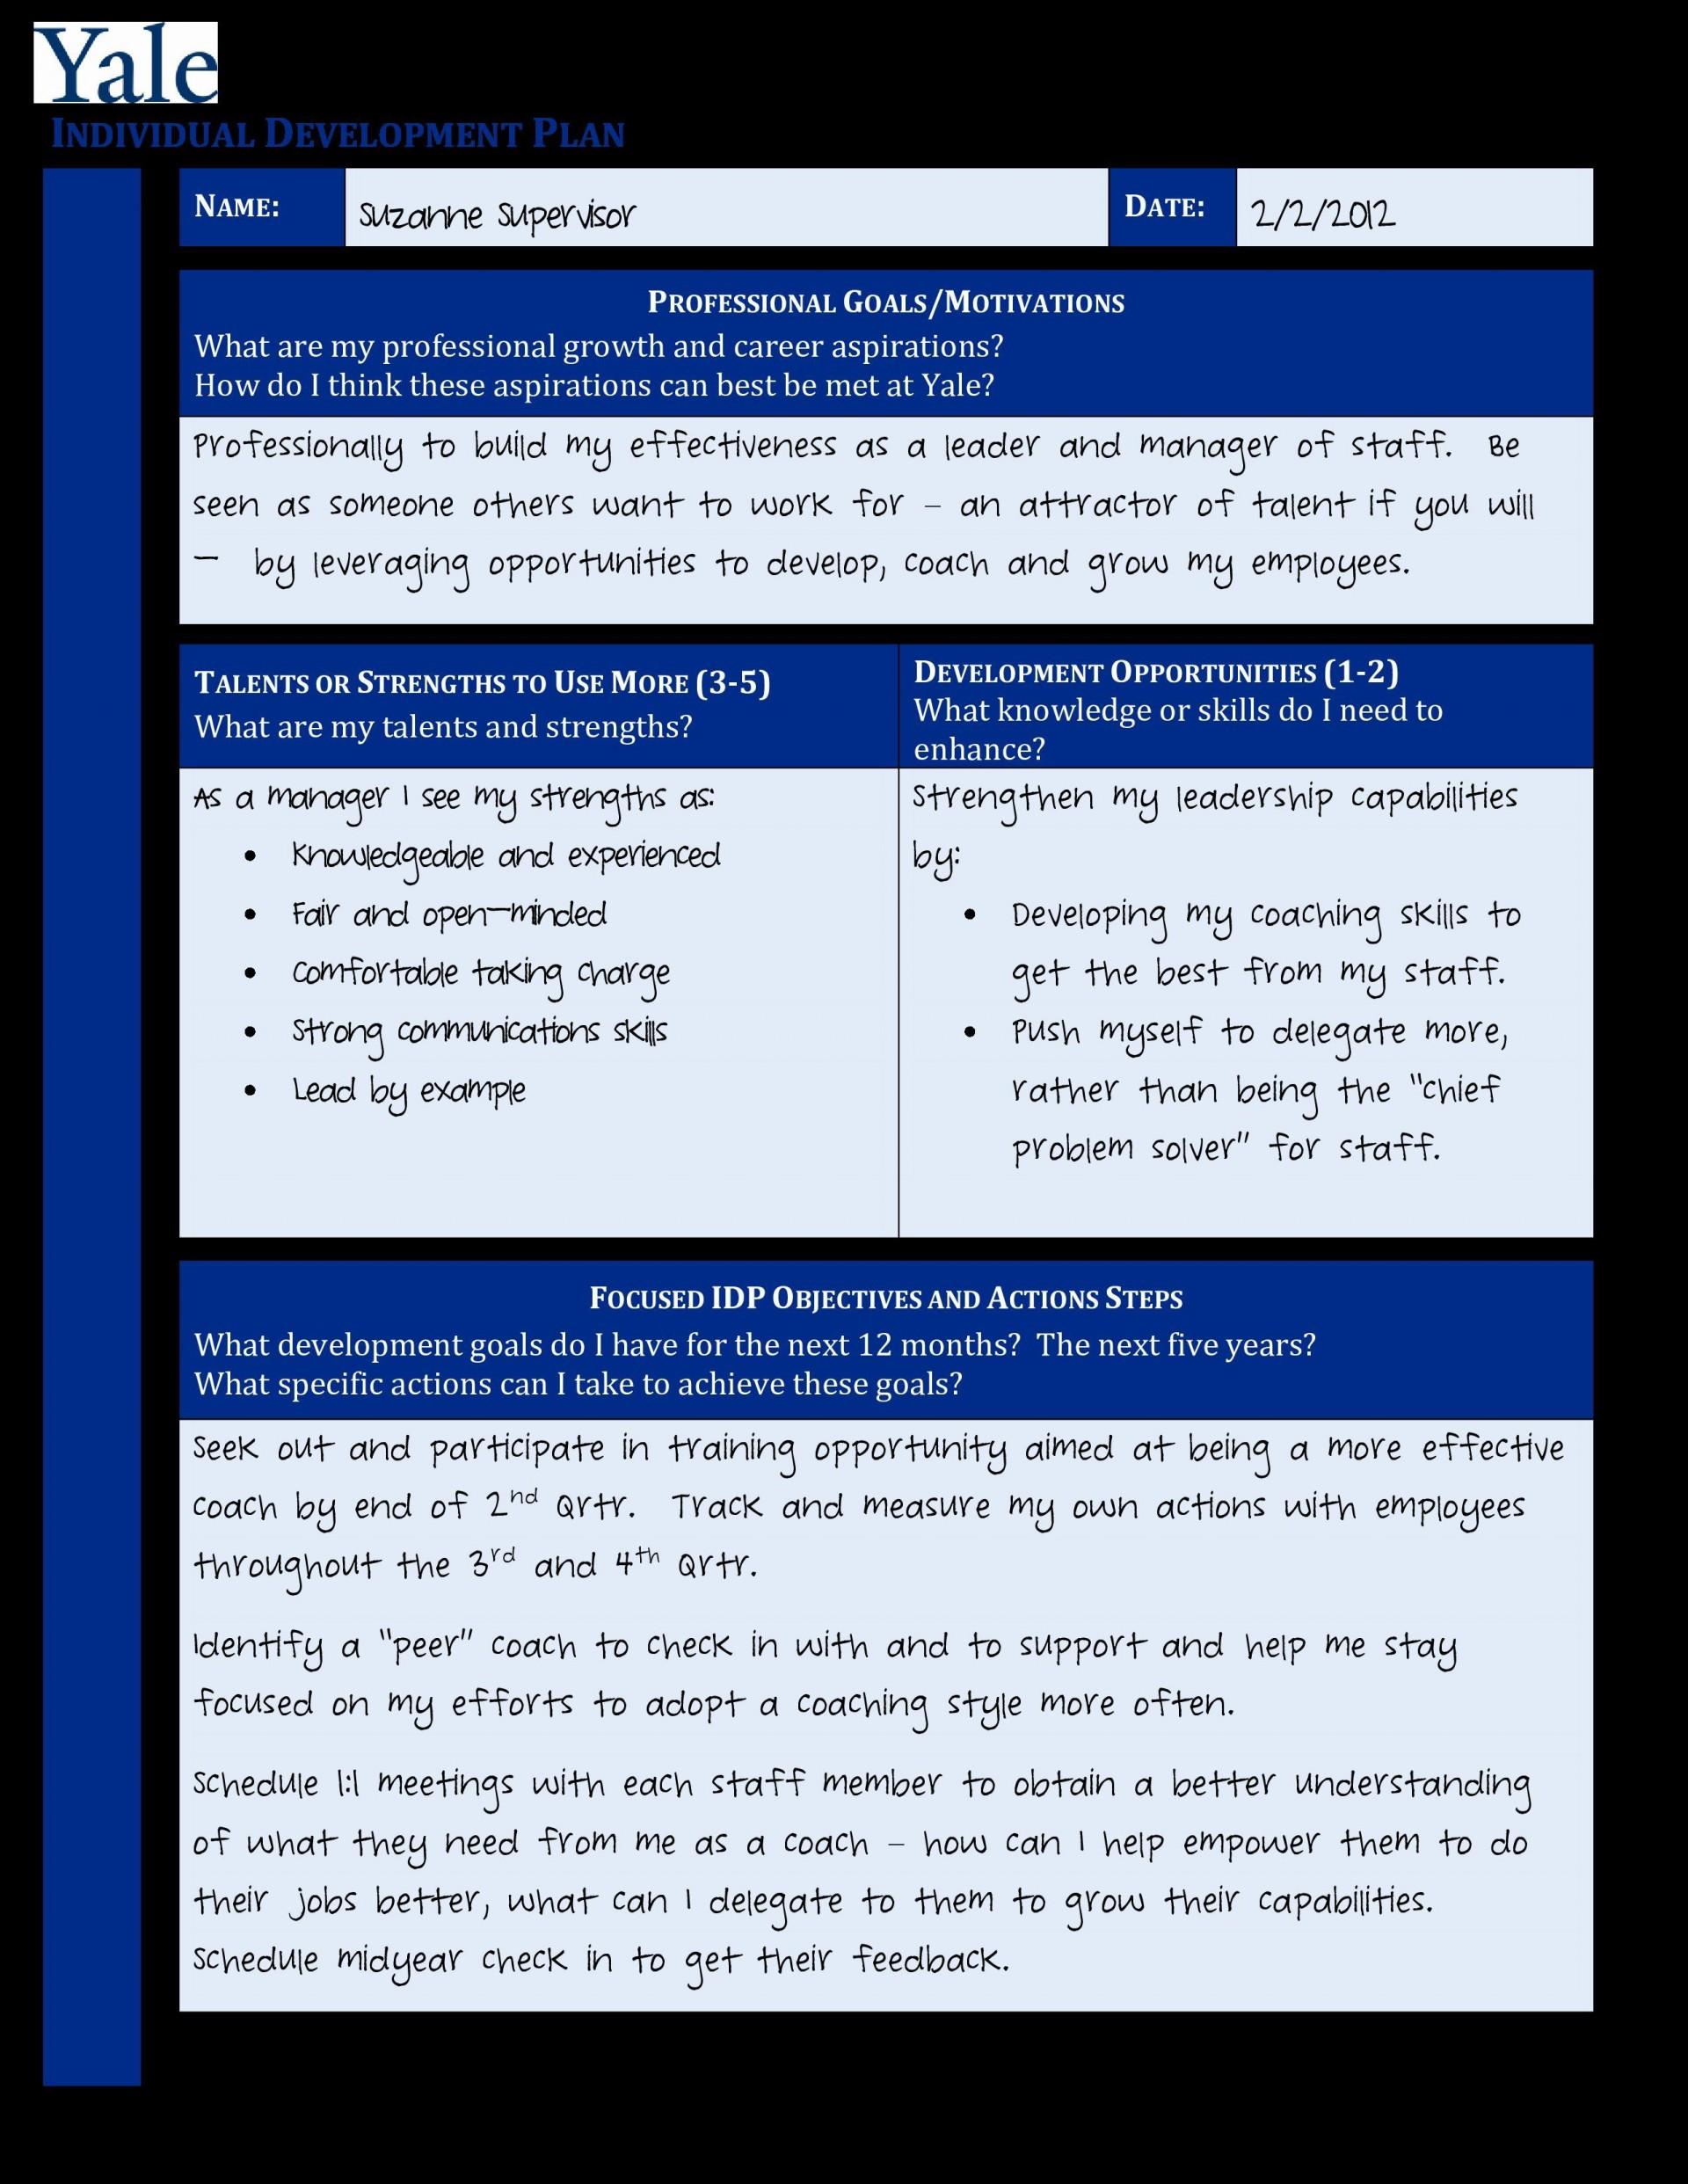 007 Surprising Professional Development Plan Template Pdf Picture  Sample Example1920